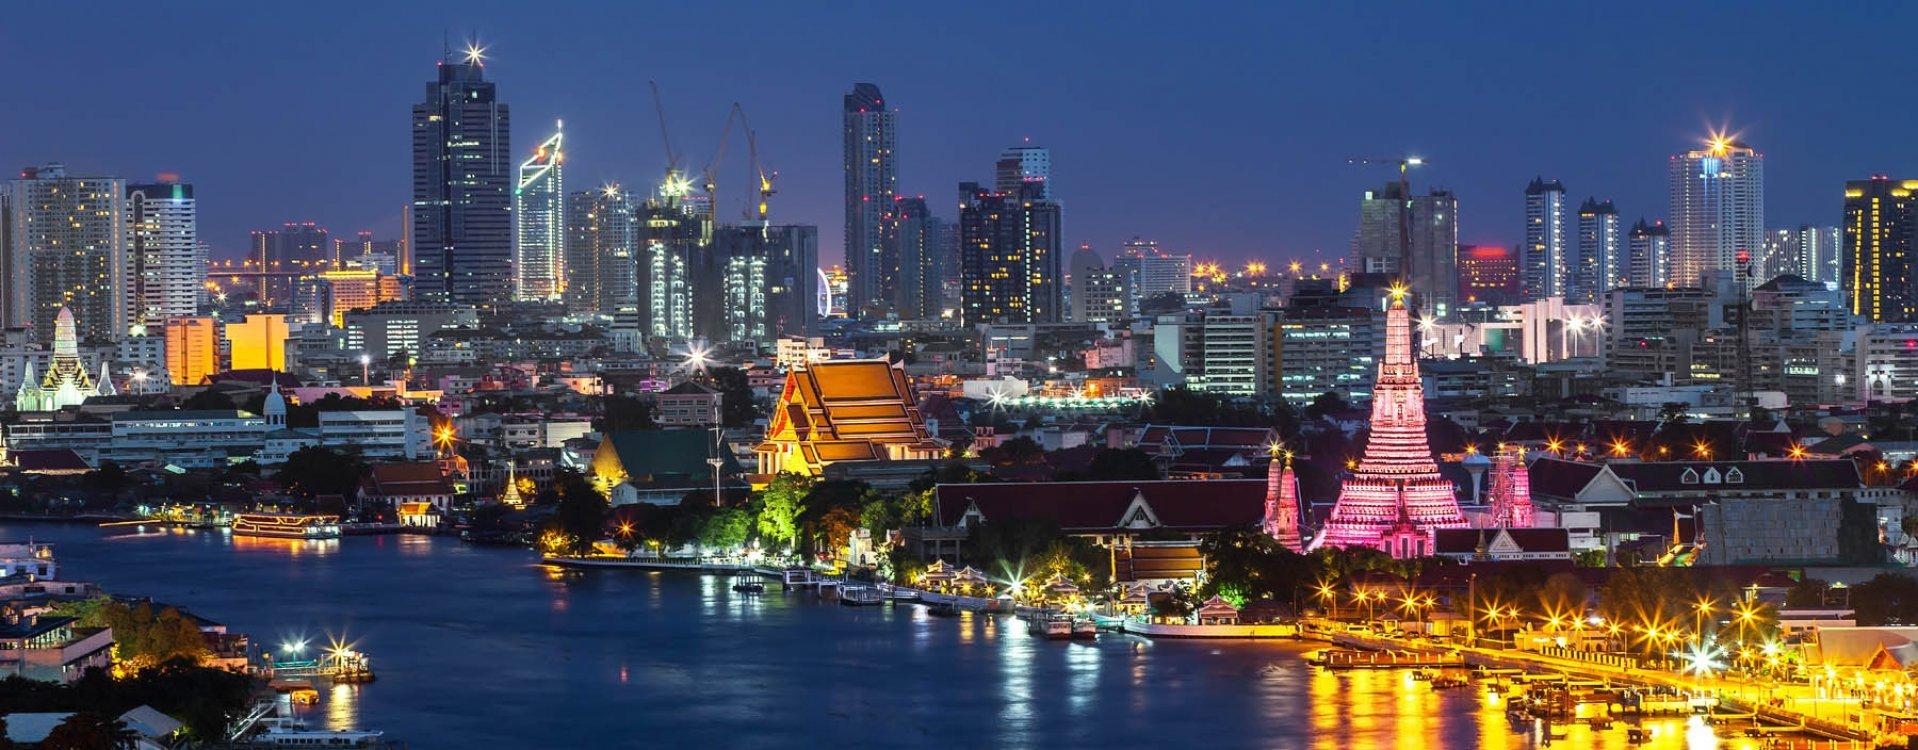 Uitzicht Chao Phraya rivier, Bangkok